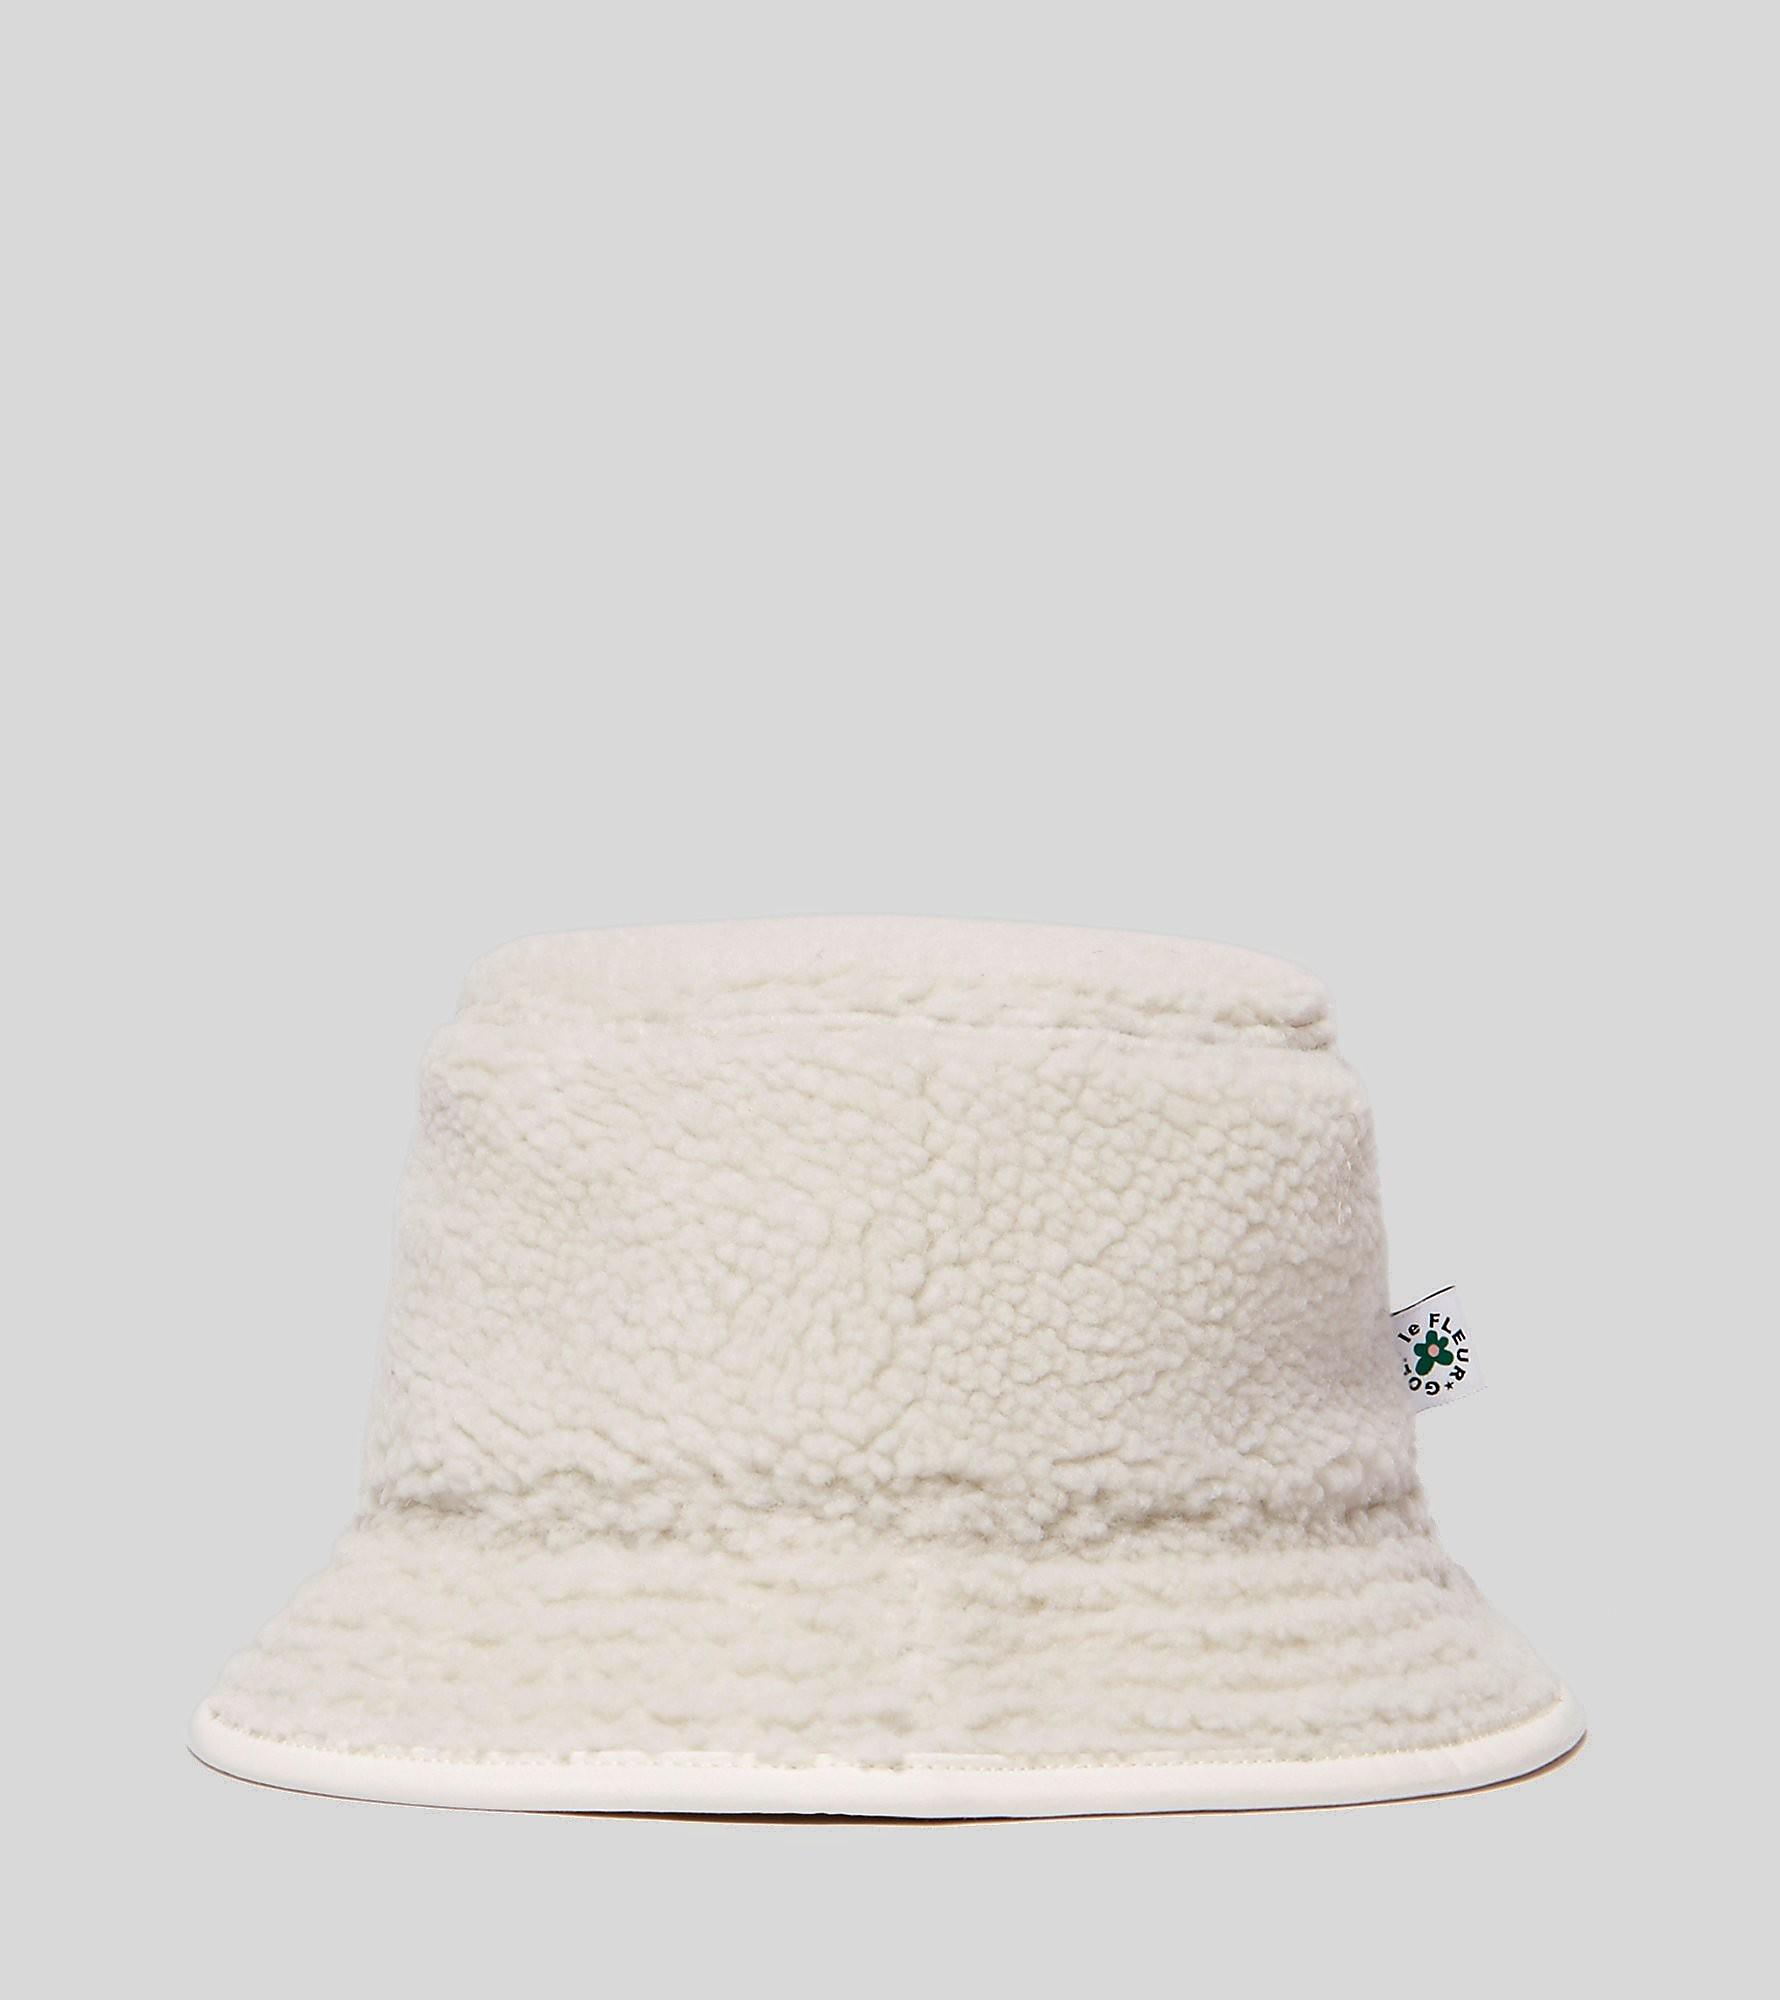 Converse x Golf le Fleur Bucket Hat